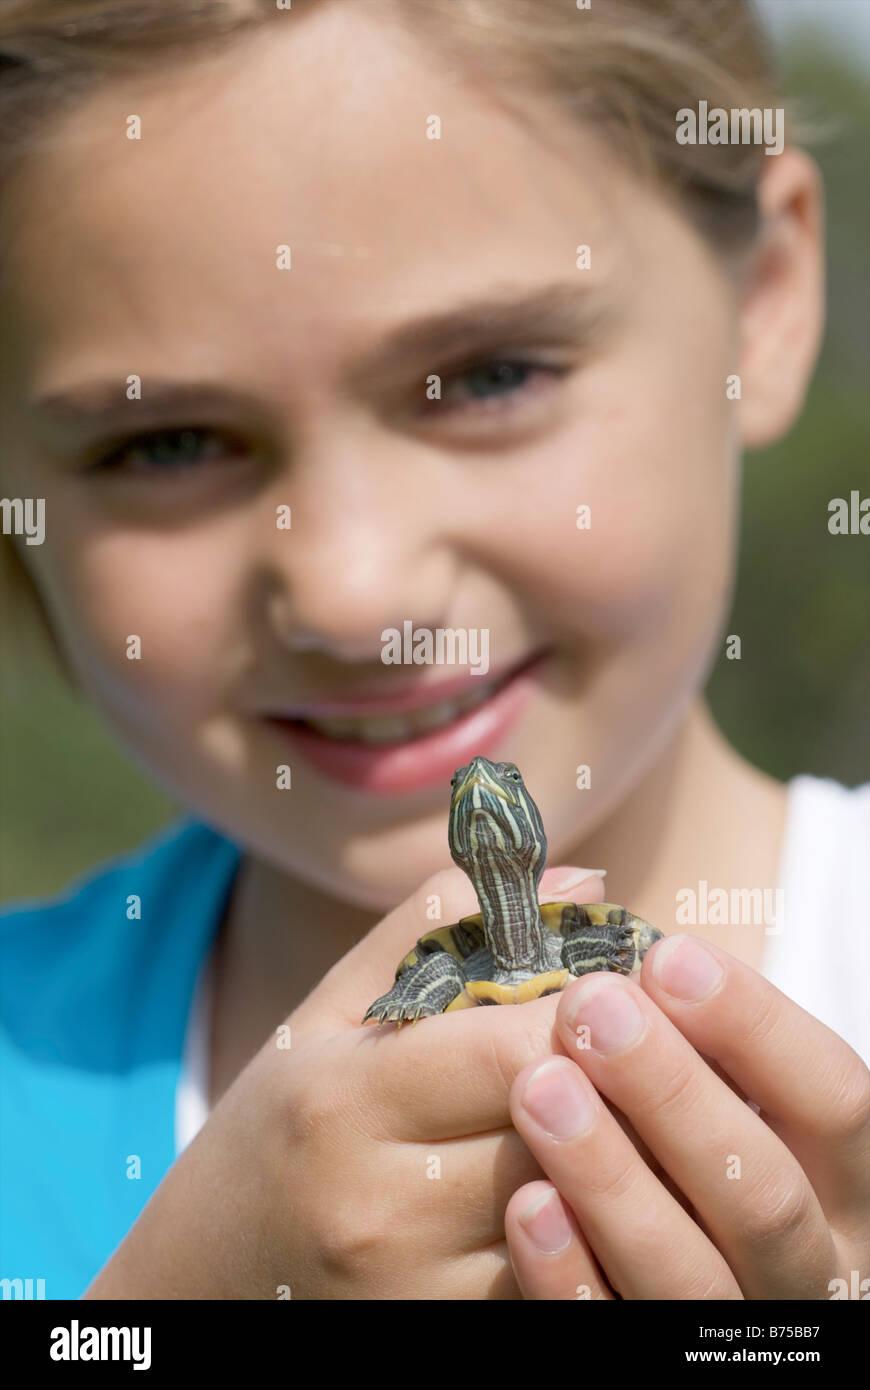 Schildkröte im Besitz achtjährigen Mädchens, Winnipeg, Kanada Stockbild